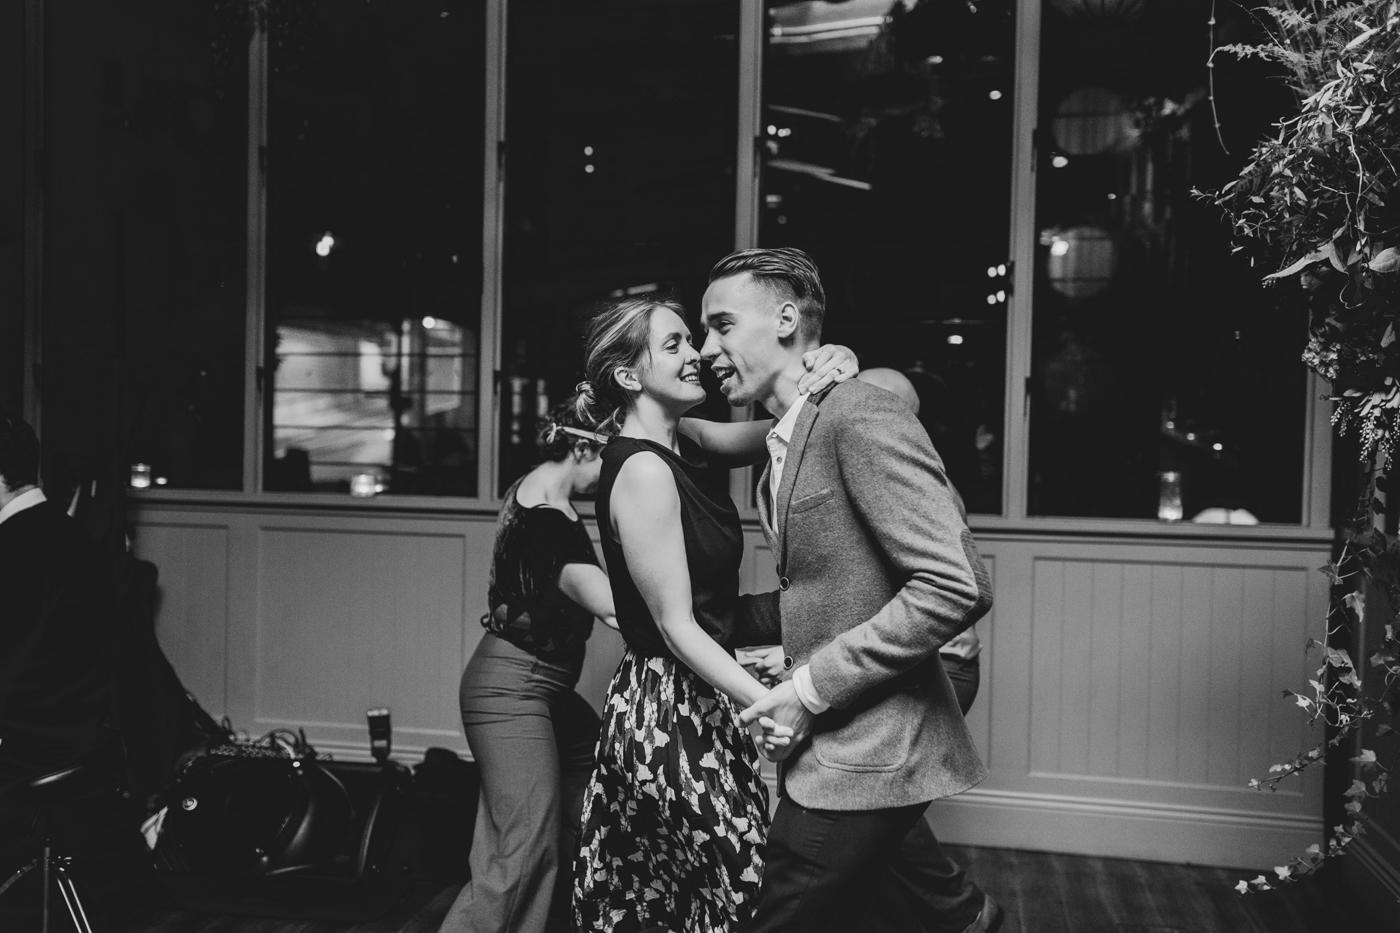 Jo & Tom Wedding - The Grounds of Alexandria - Samantha Heather Photography-346.jpg